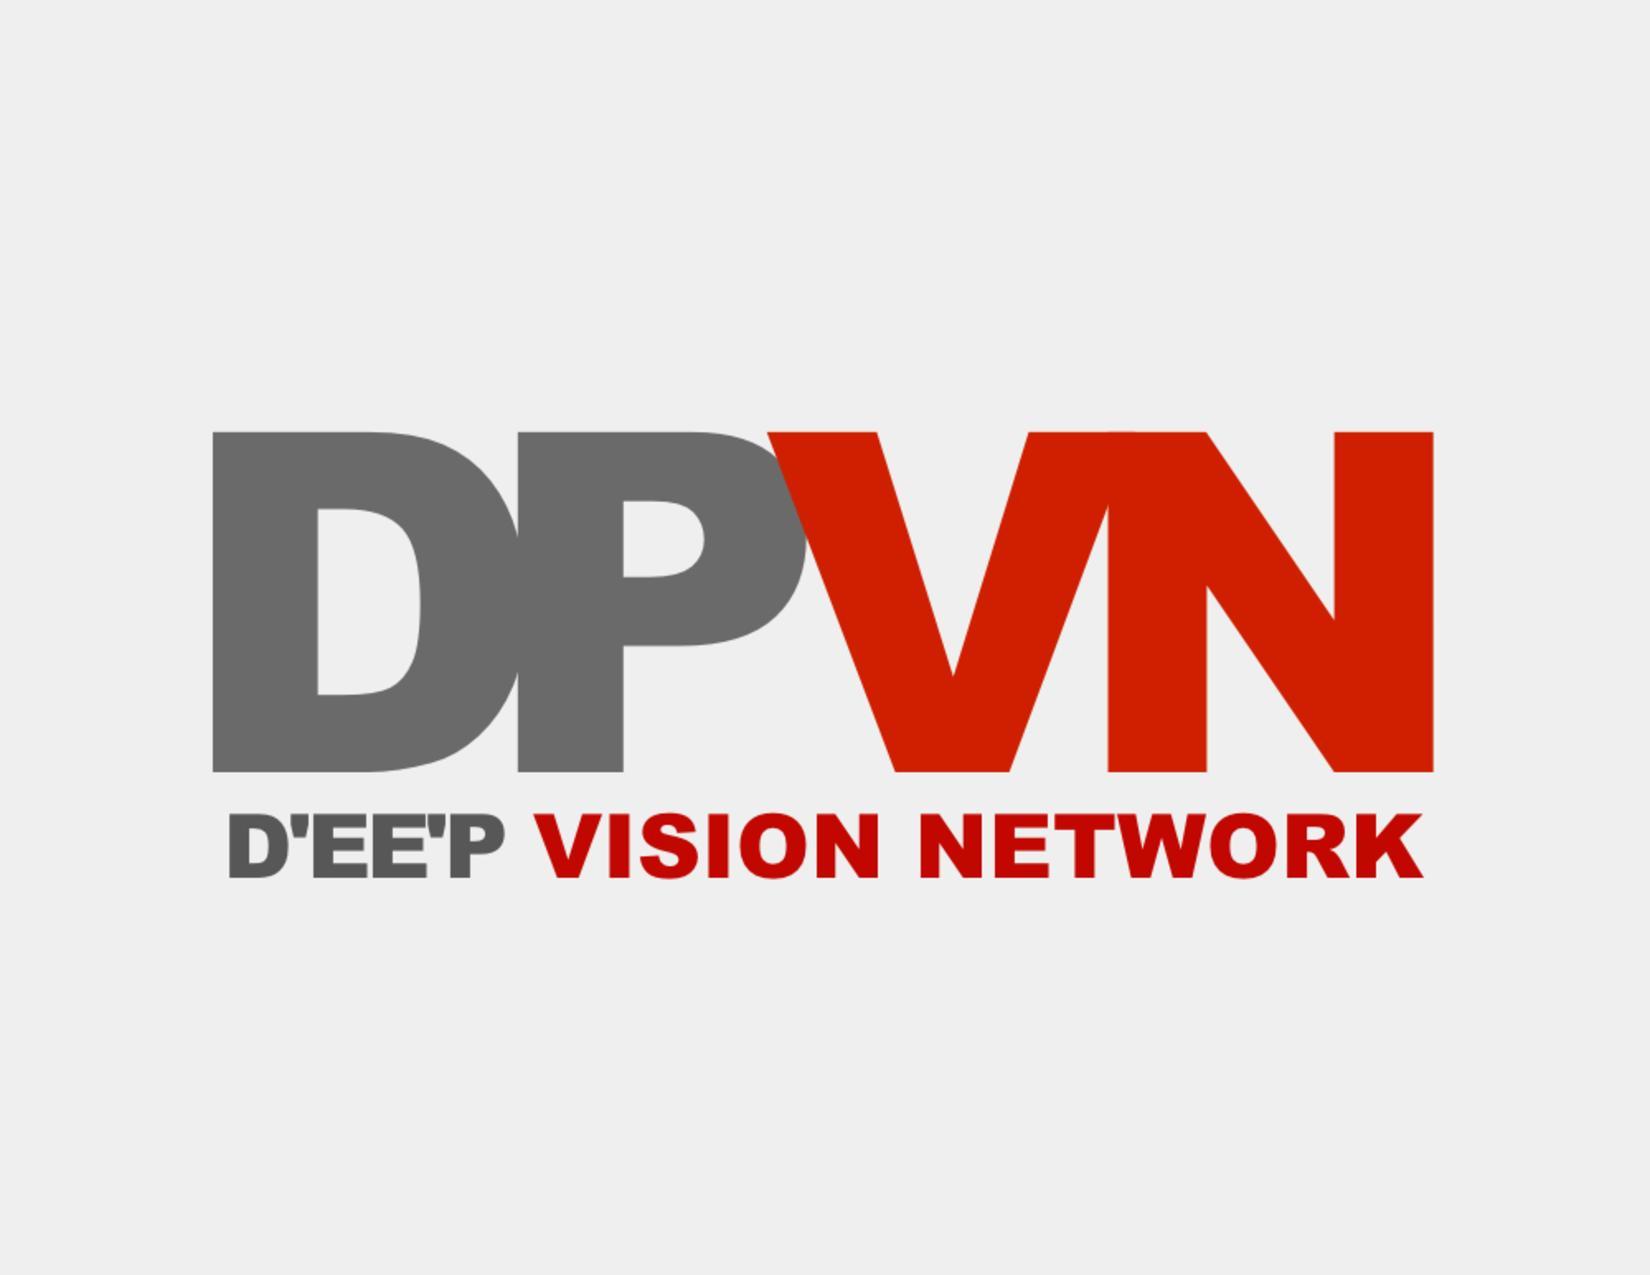 Be A DPVN Ambassador